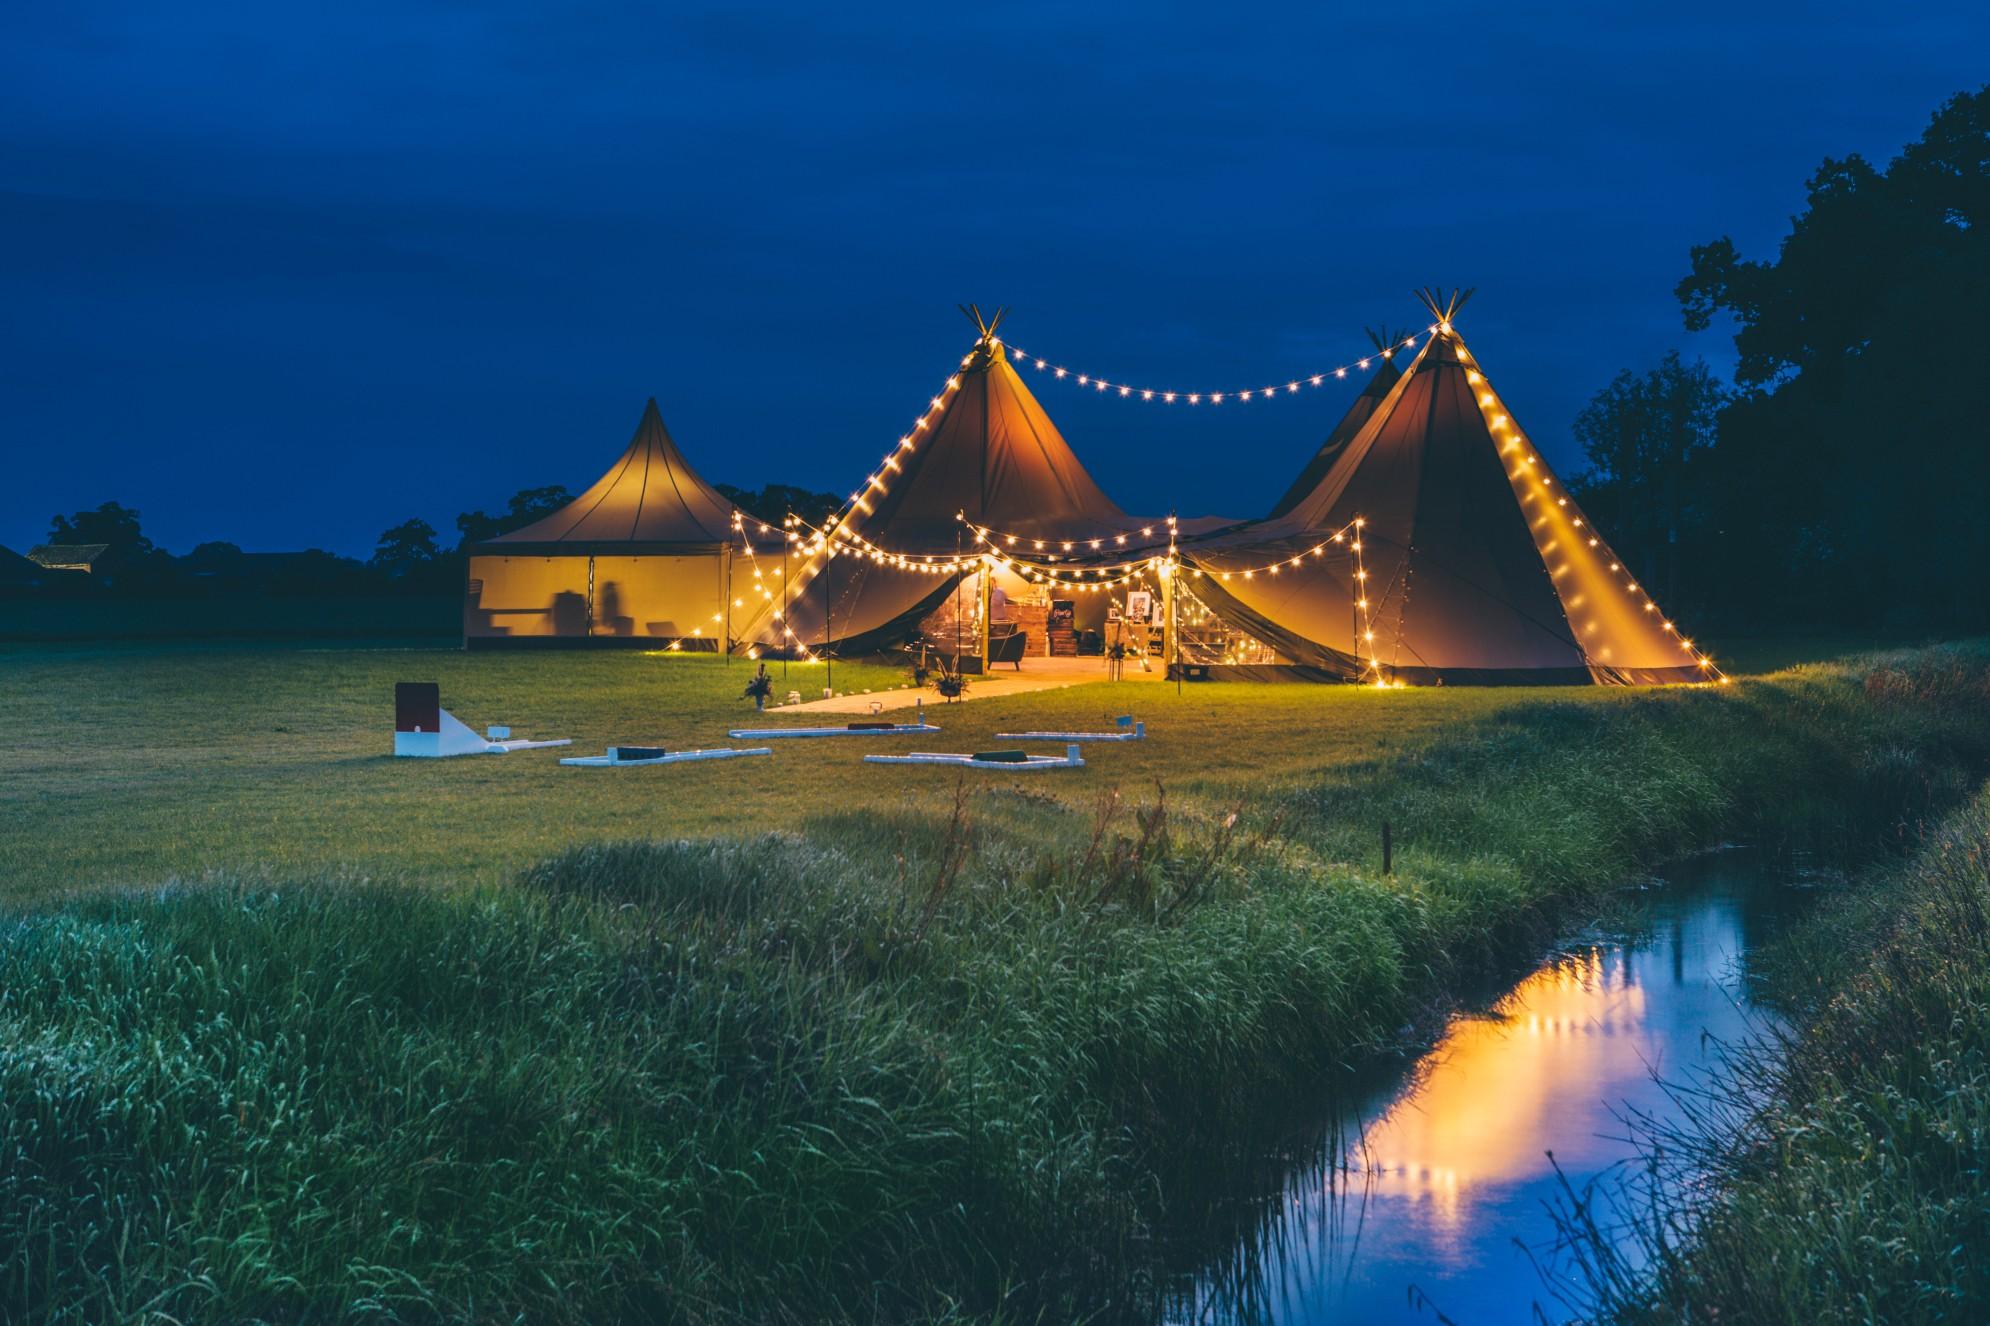 cuttlebrook - derbyshire outdoor wedding venue - field wedding - tipi wedding venue east midlands - river wedding - tipi at night